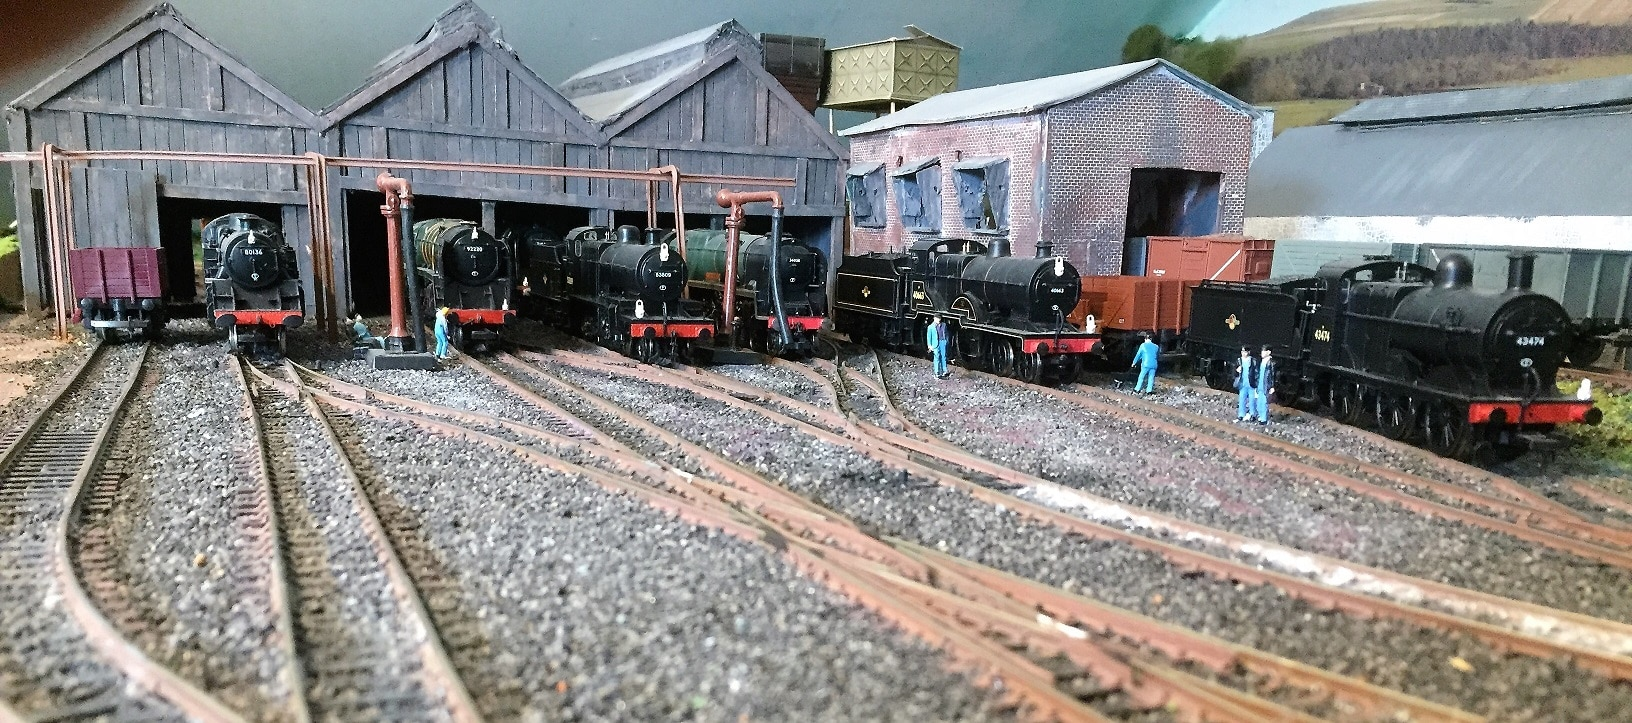 Loco line-up outside model railway shed 00 gauge